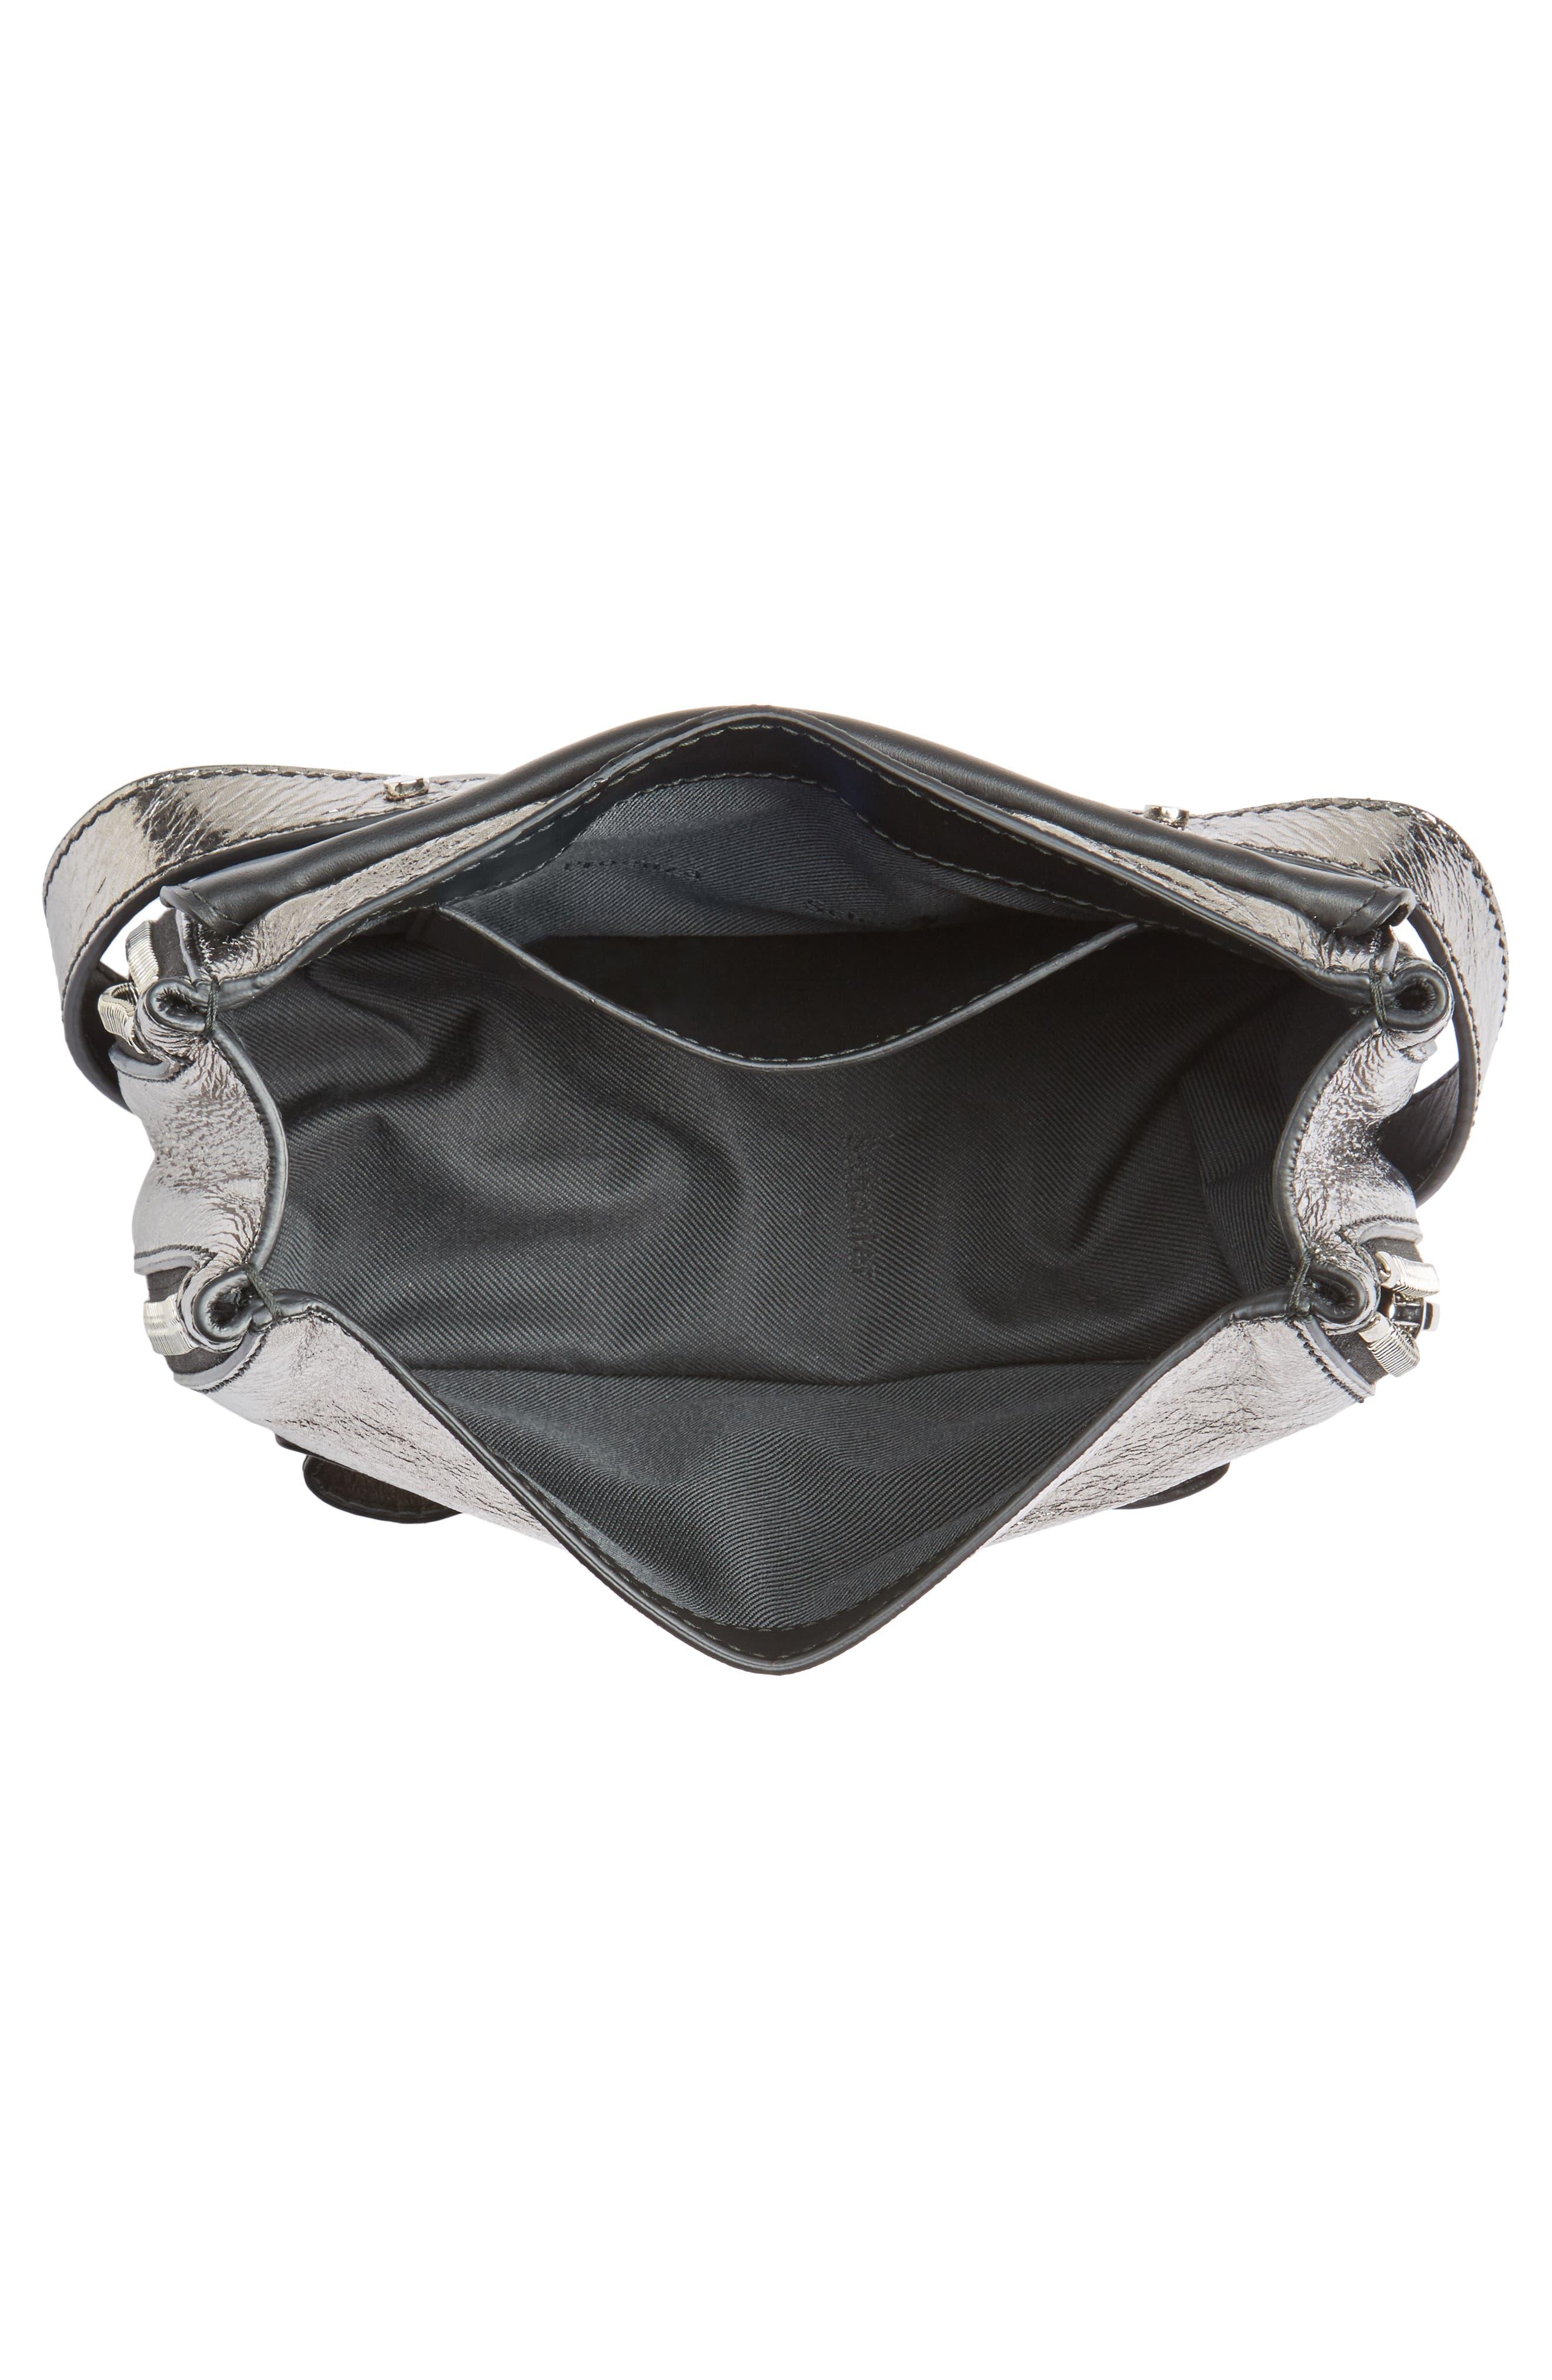 Mini PS1 Metallic Leather Crossbody Bag,                             Alternate thumbnail 4, color,                             Dark Silver